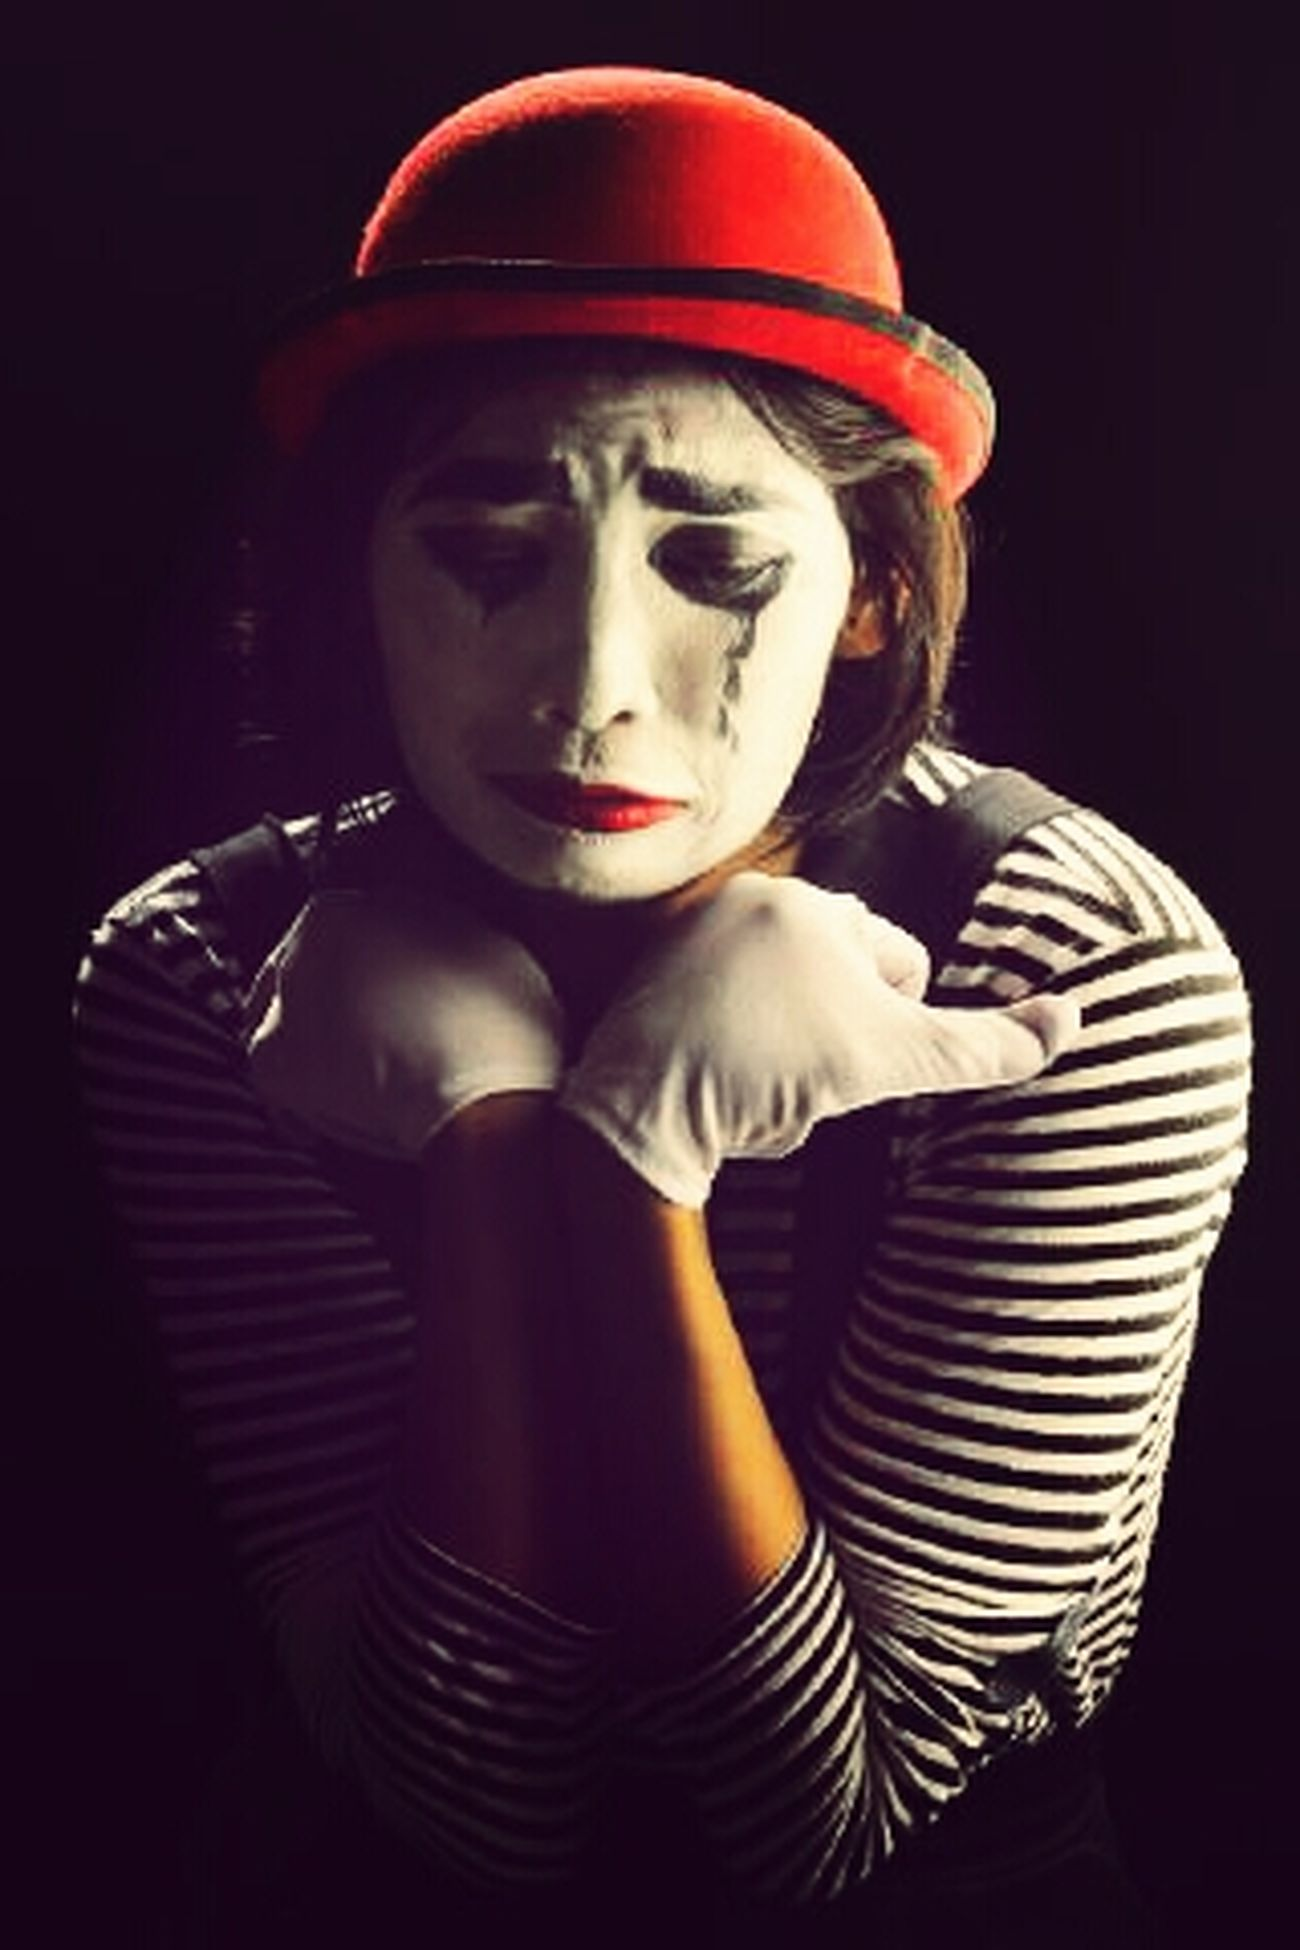 AStudioMakeUp Mood Photo Makeupartist Fashion Photography Capture : Riska / Make Up : A Studio Make Up